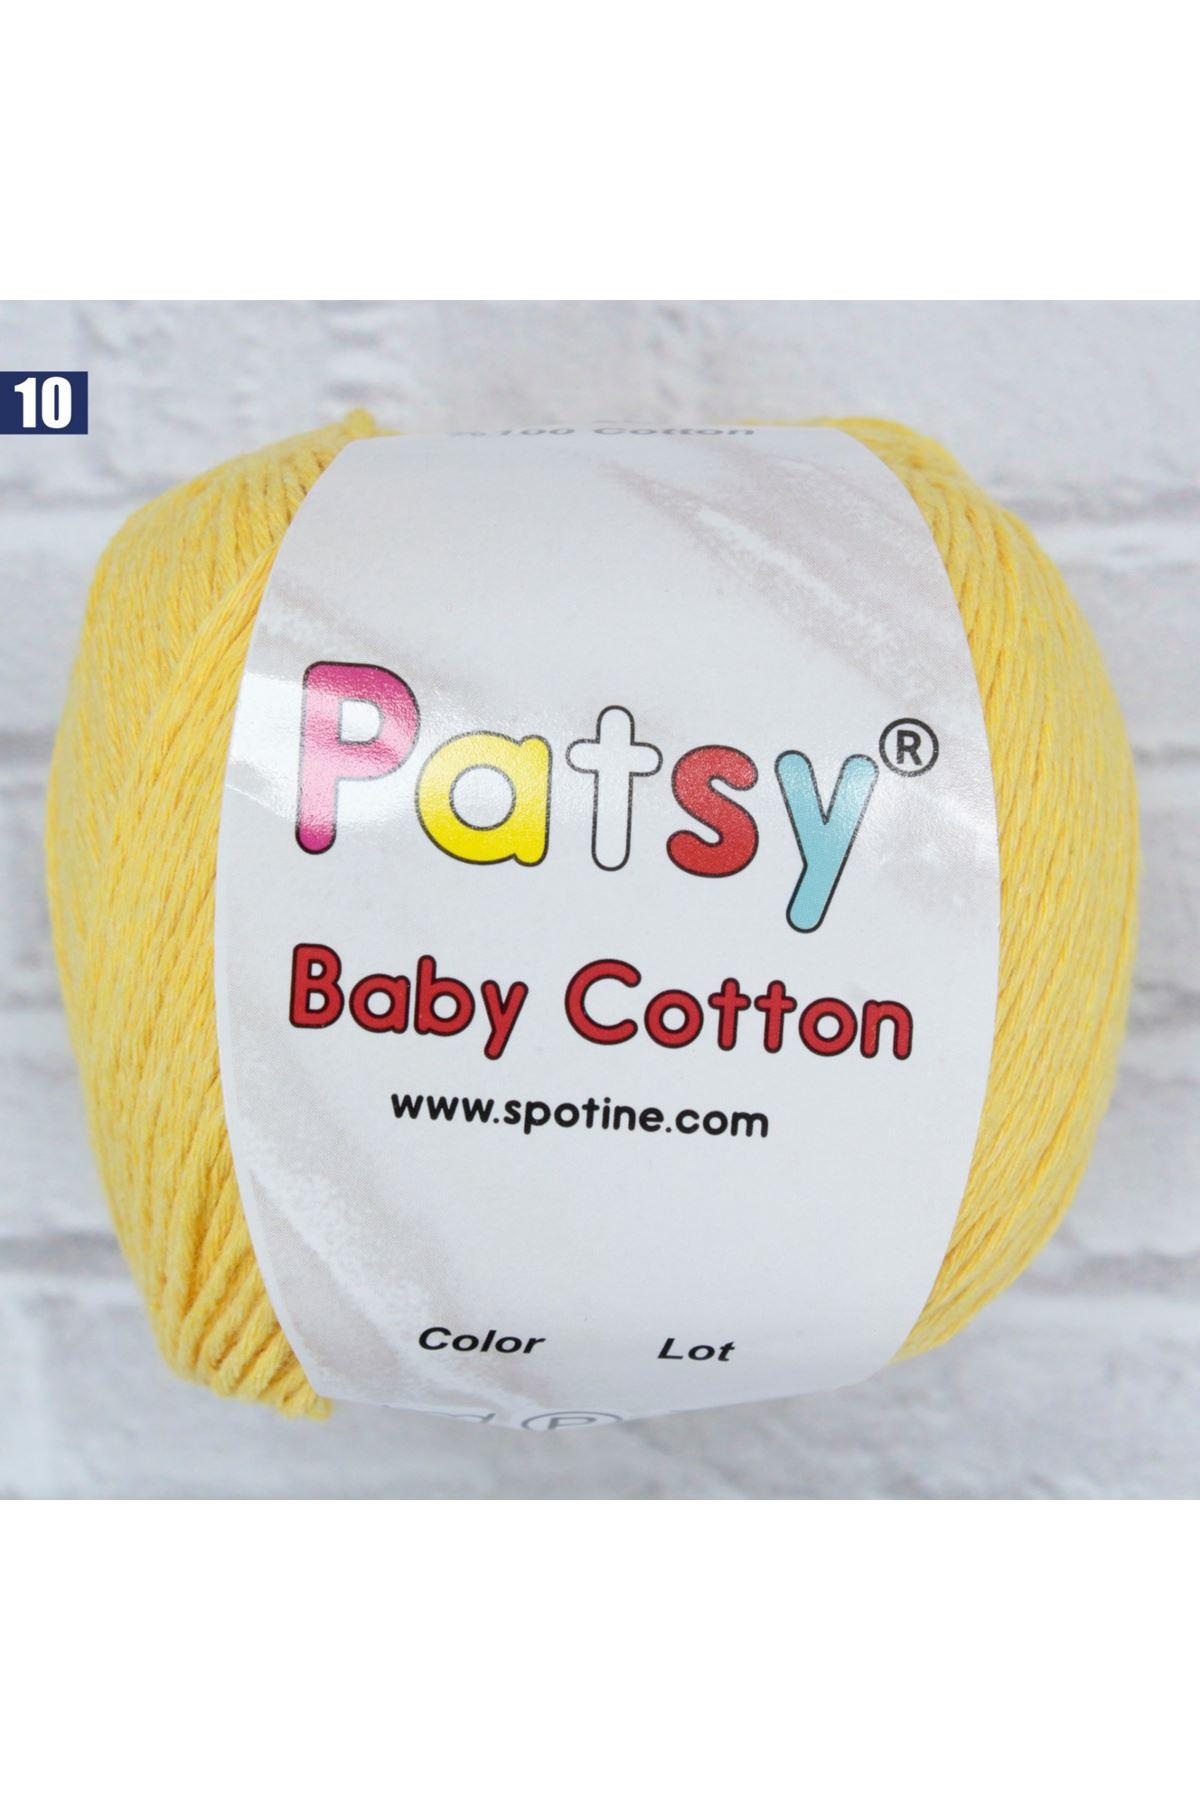 Patsy Baby Cotton 10